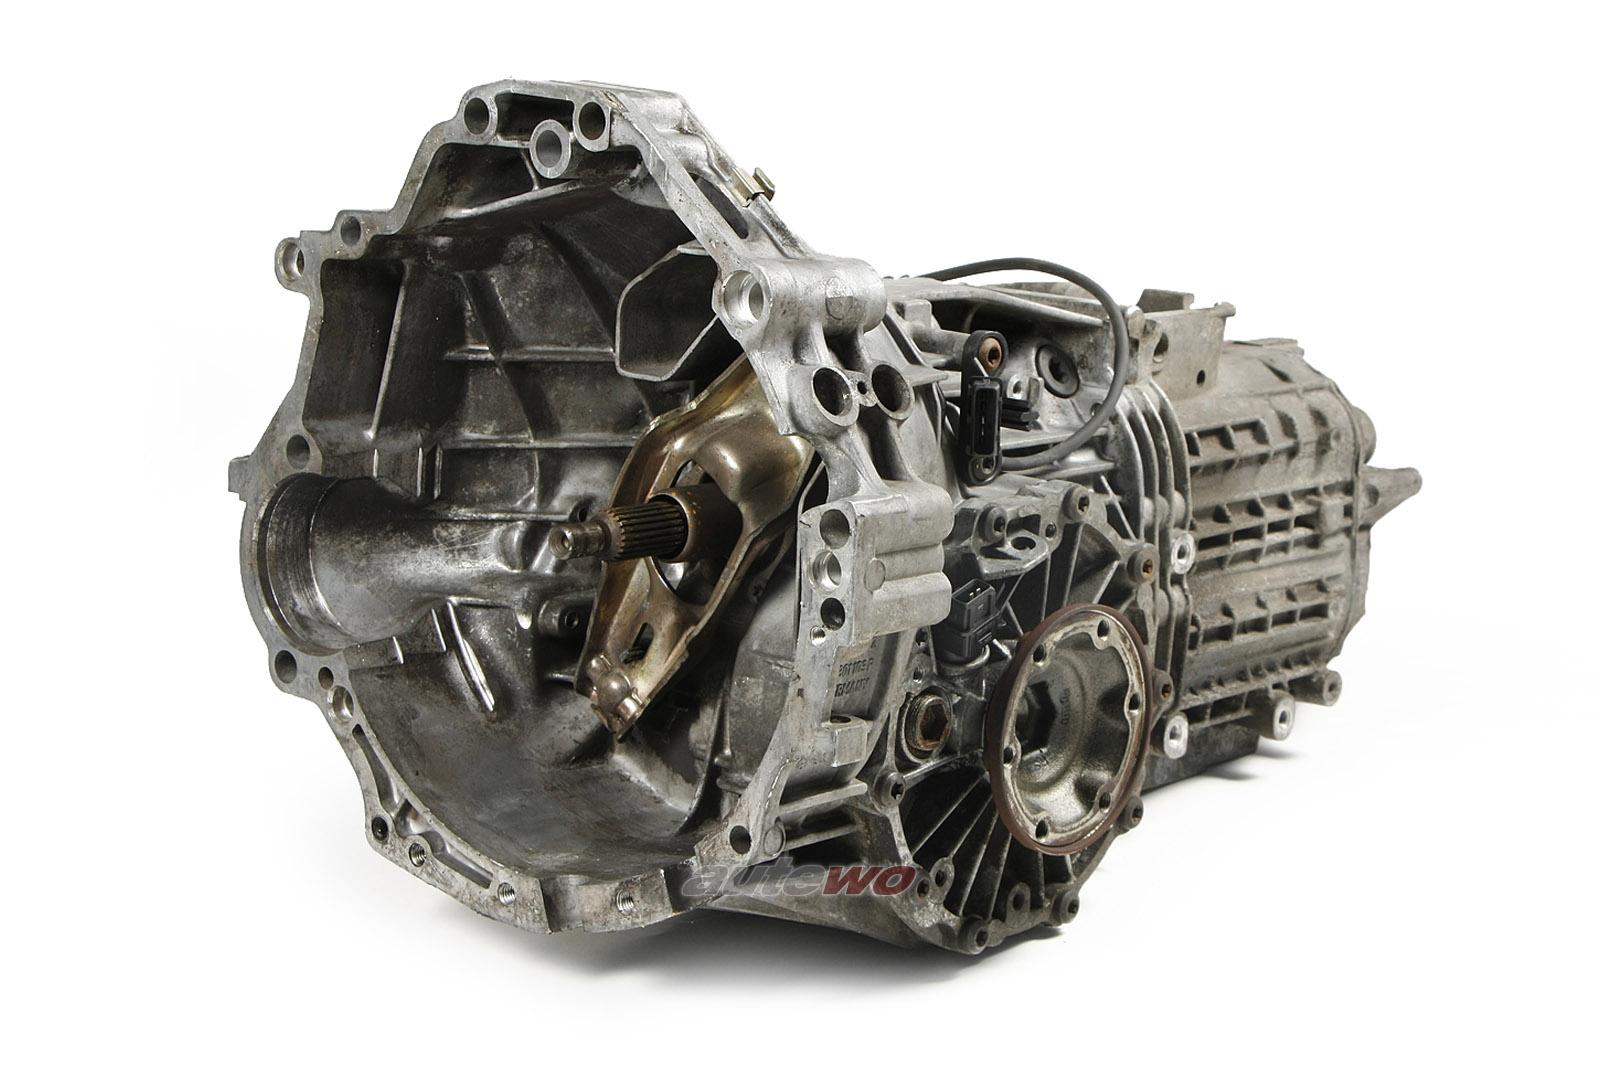 012300053CX Audi/VW 80 Typ 89 Cabrio/A4 B5/A6 C4 1.8l Getriebe DHZ 24127